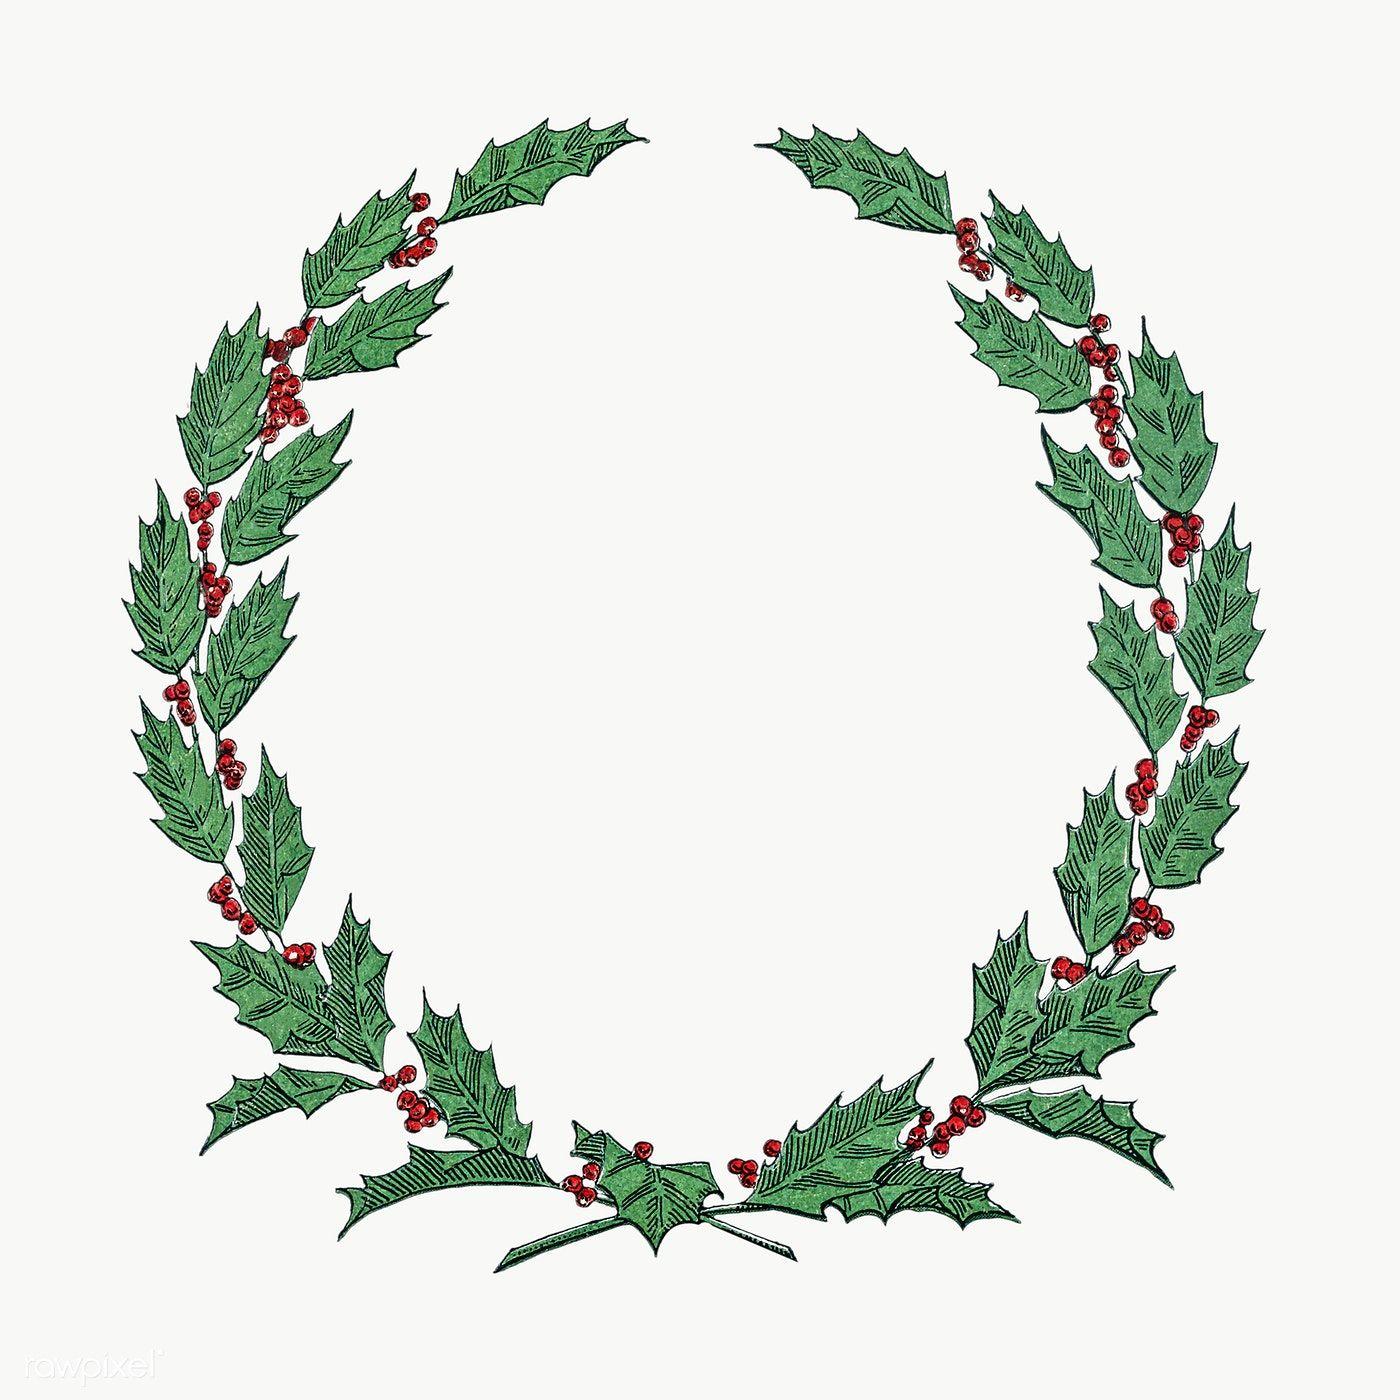 Download Premium Png Of Festive Christmas Wreath Transparent Png 1232619